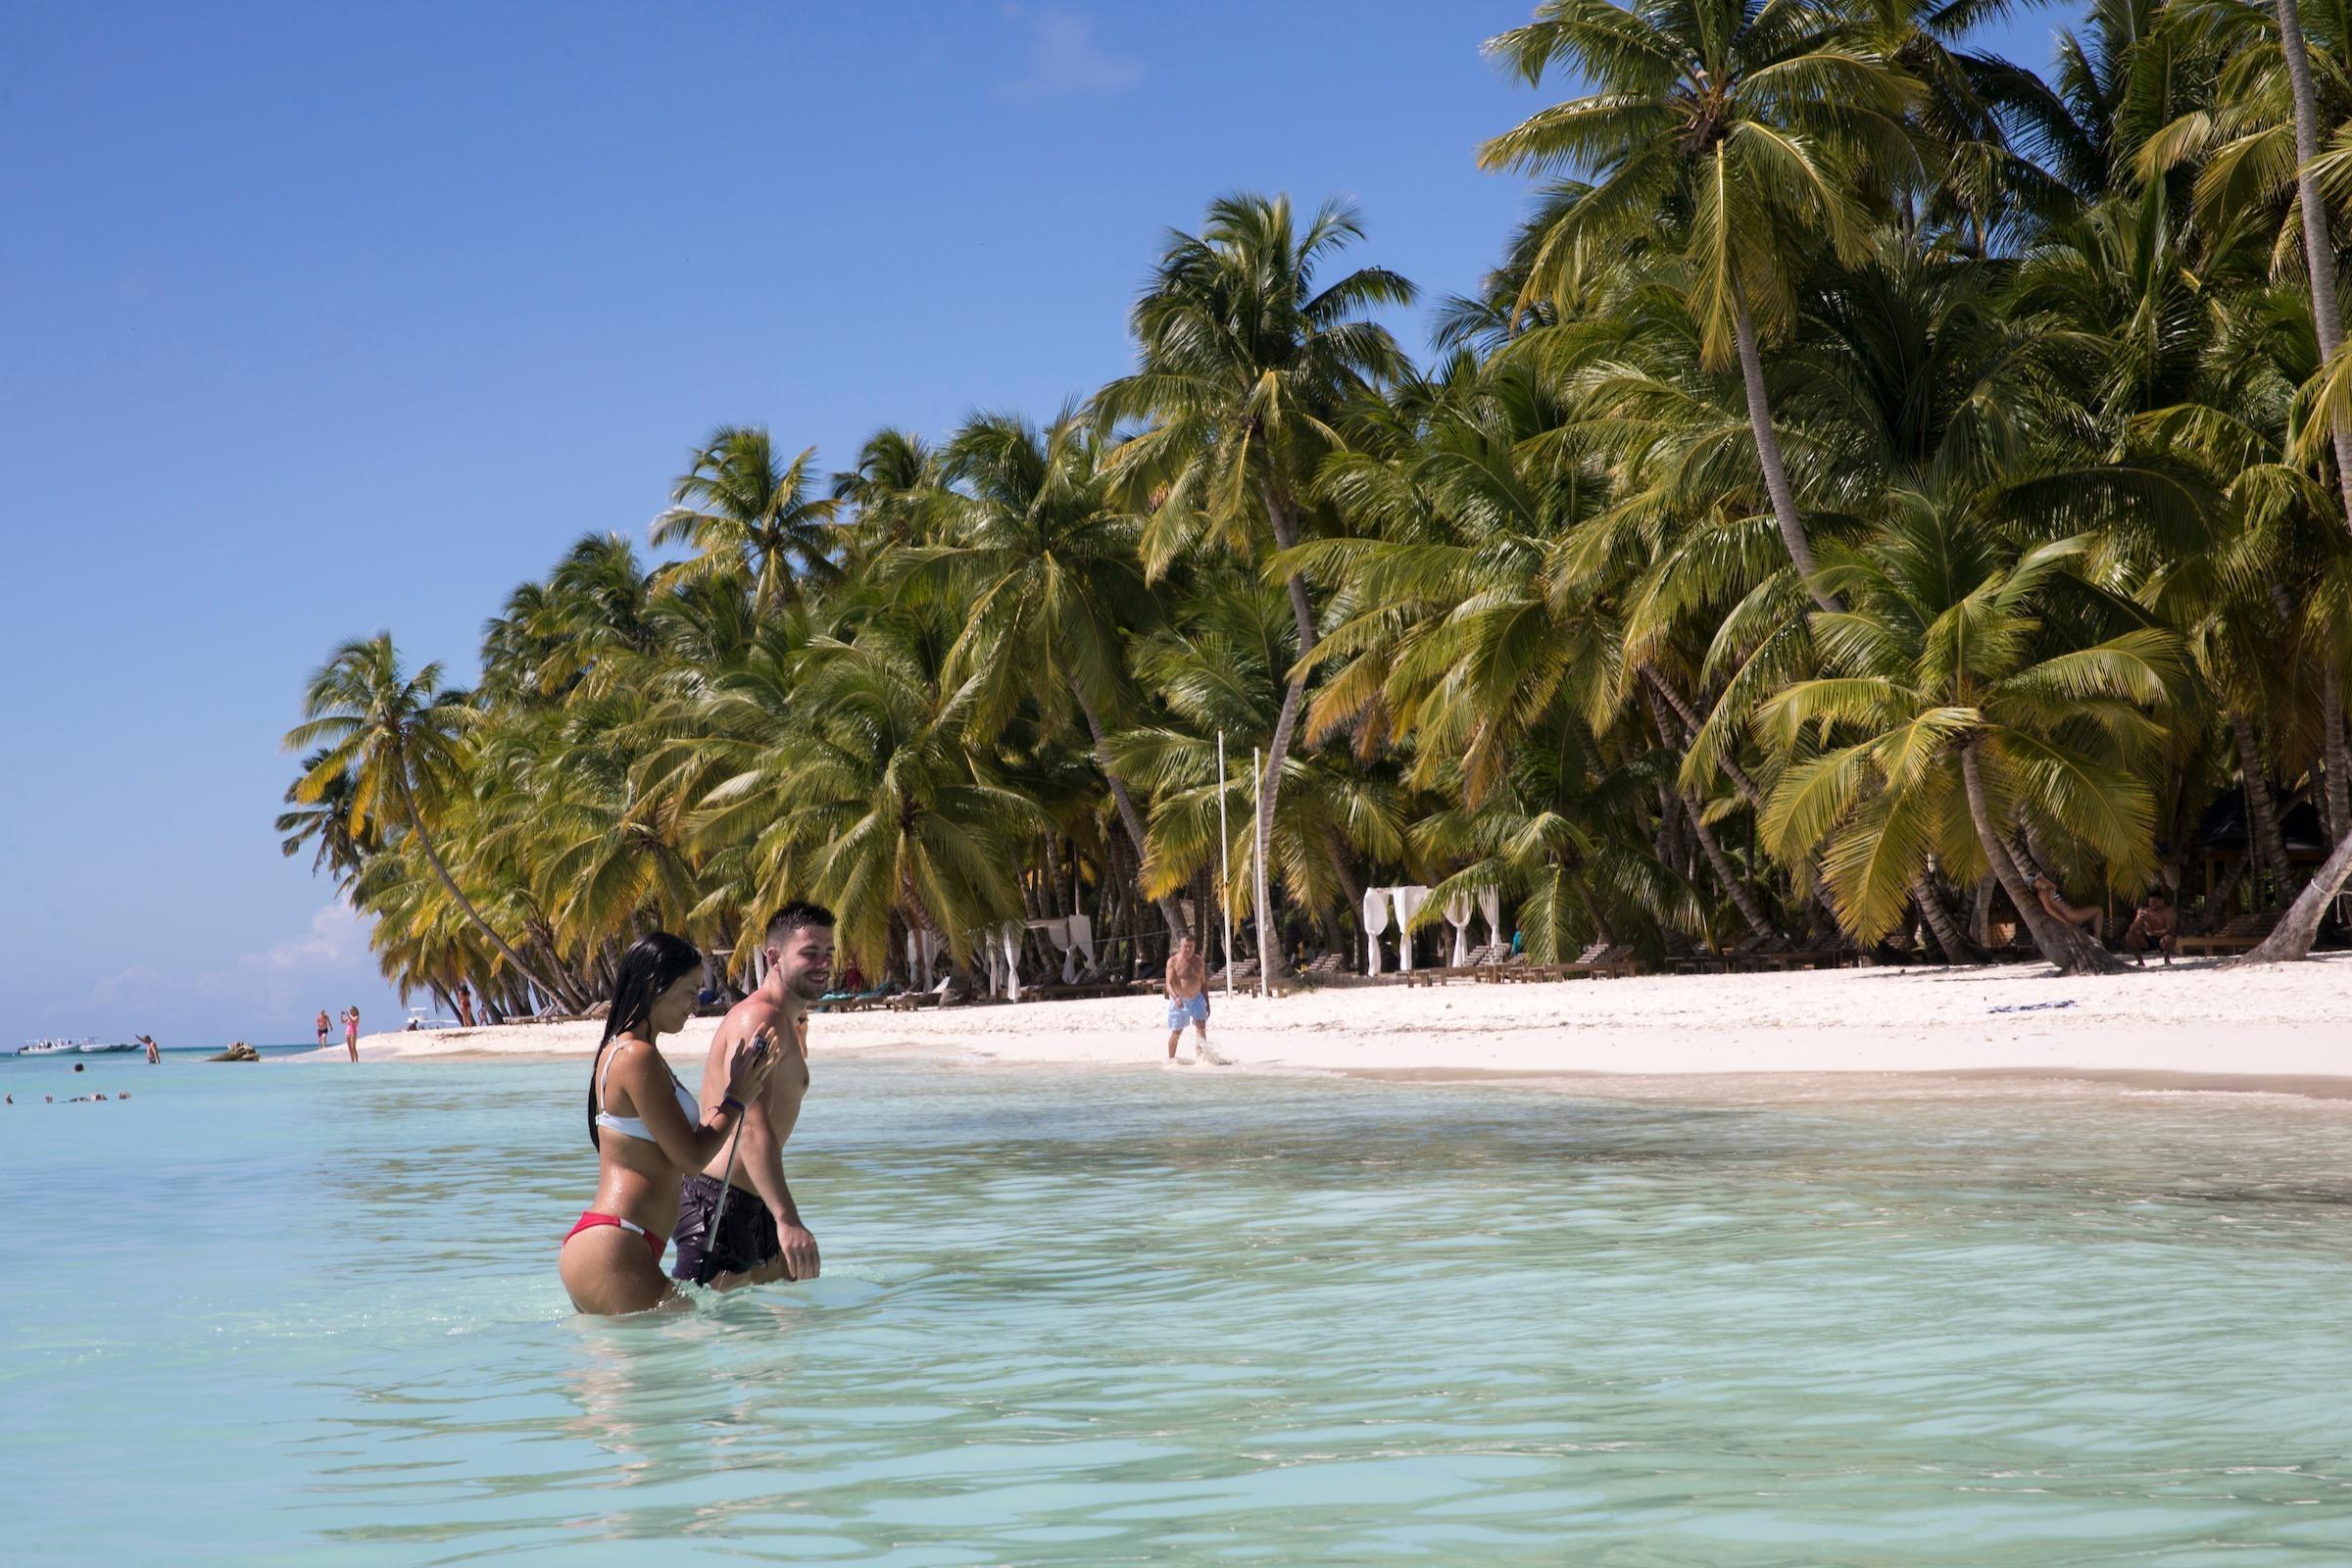 Saona Island Day Trips from Punta Cana